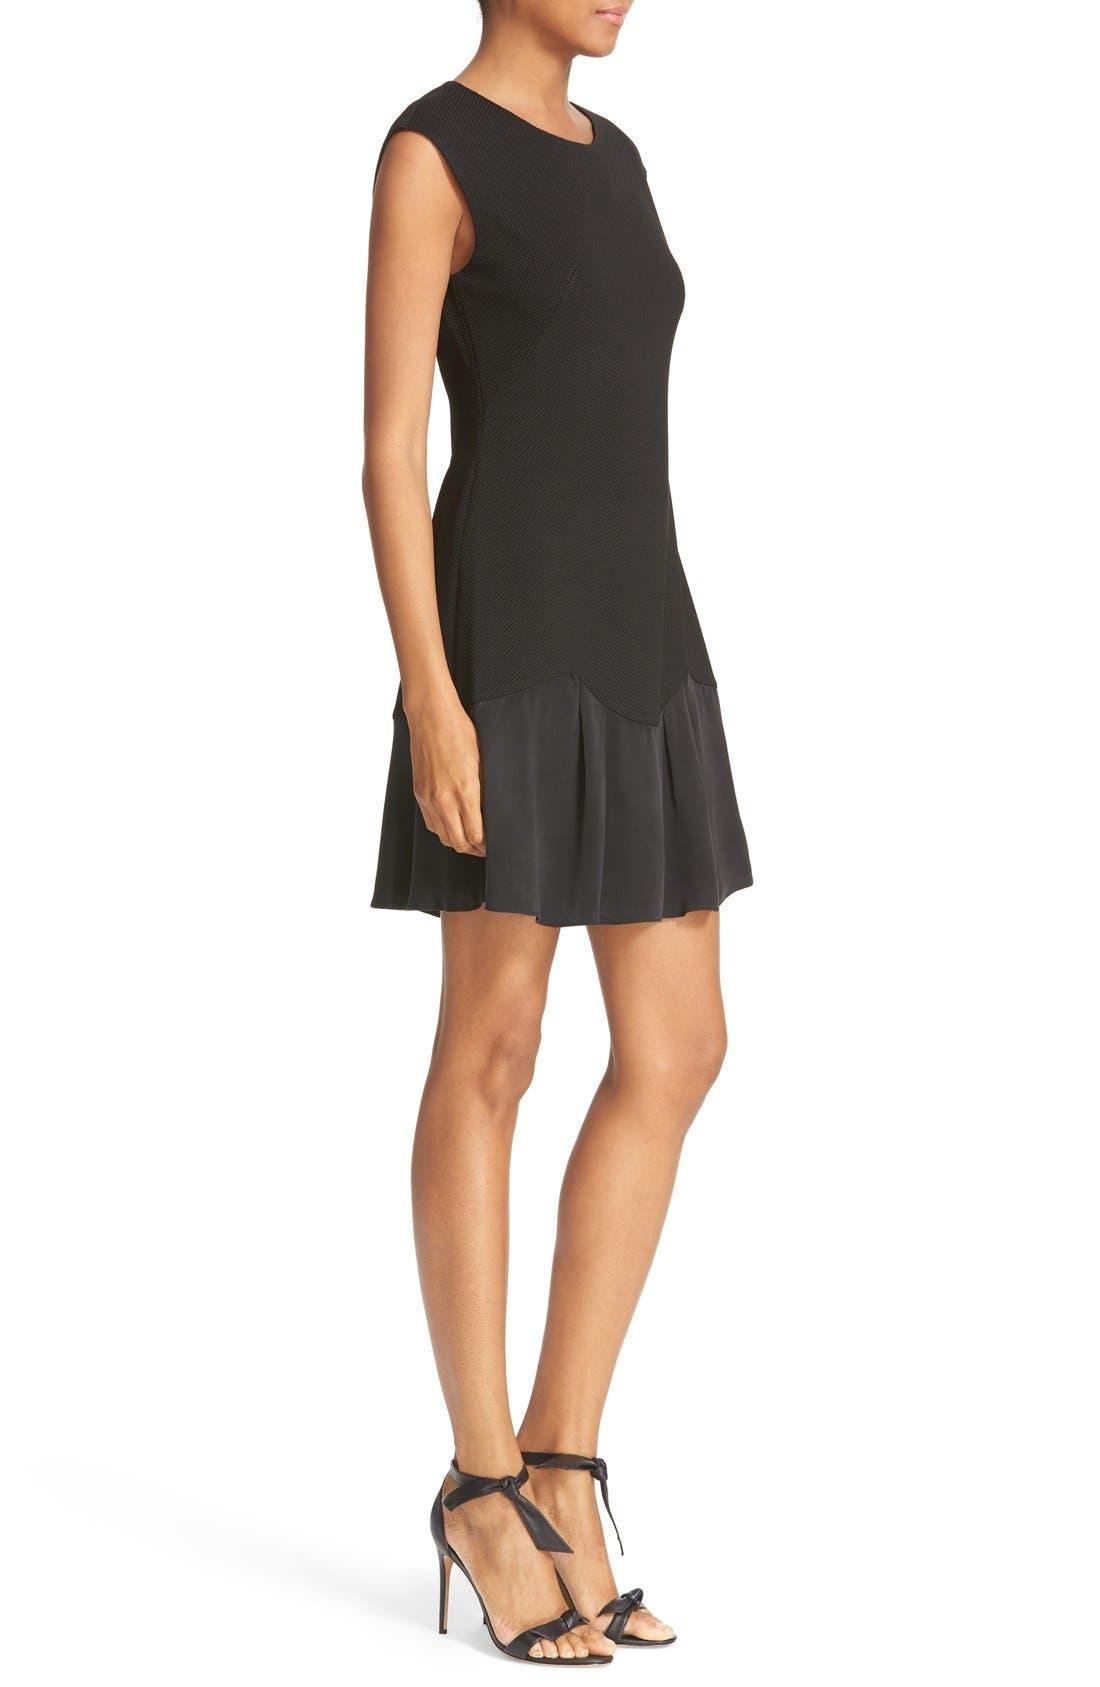 REBECCA TAYLOR, Stacy Drop Waist Dress, Alternate thumbnail 3, color, BLACK